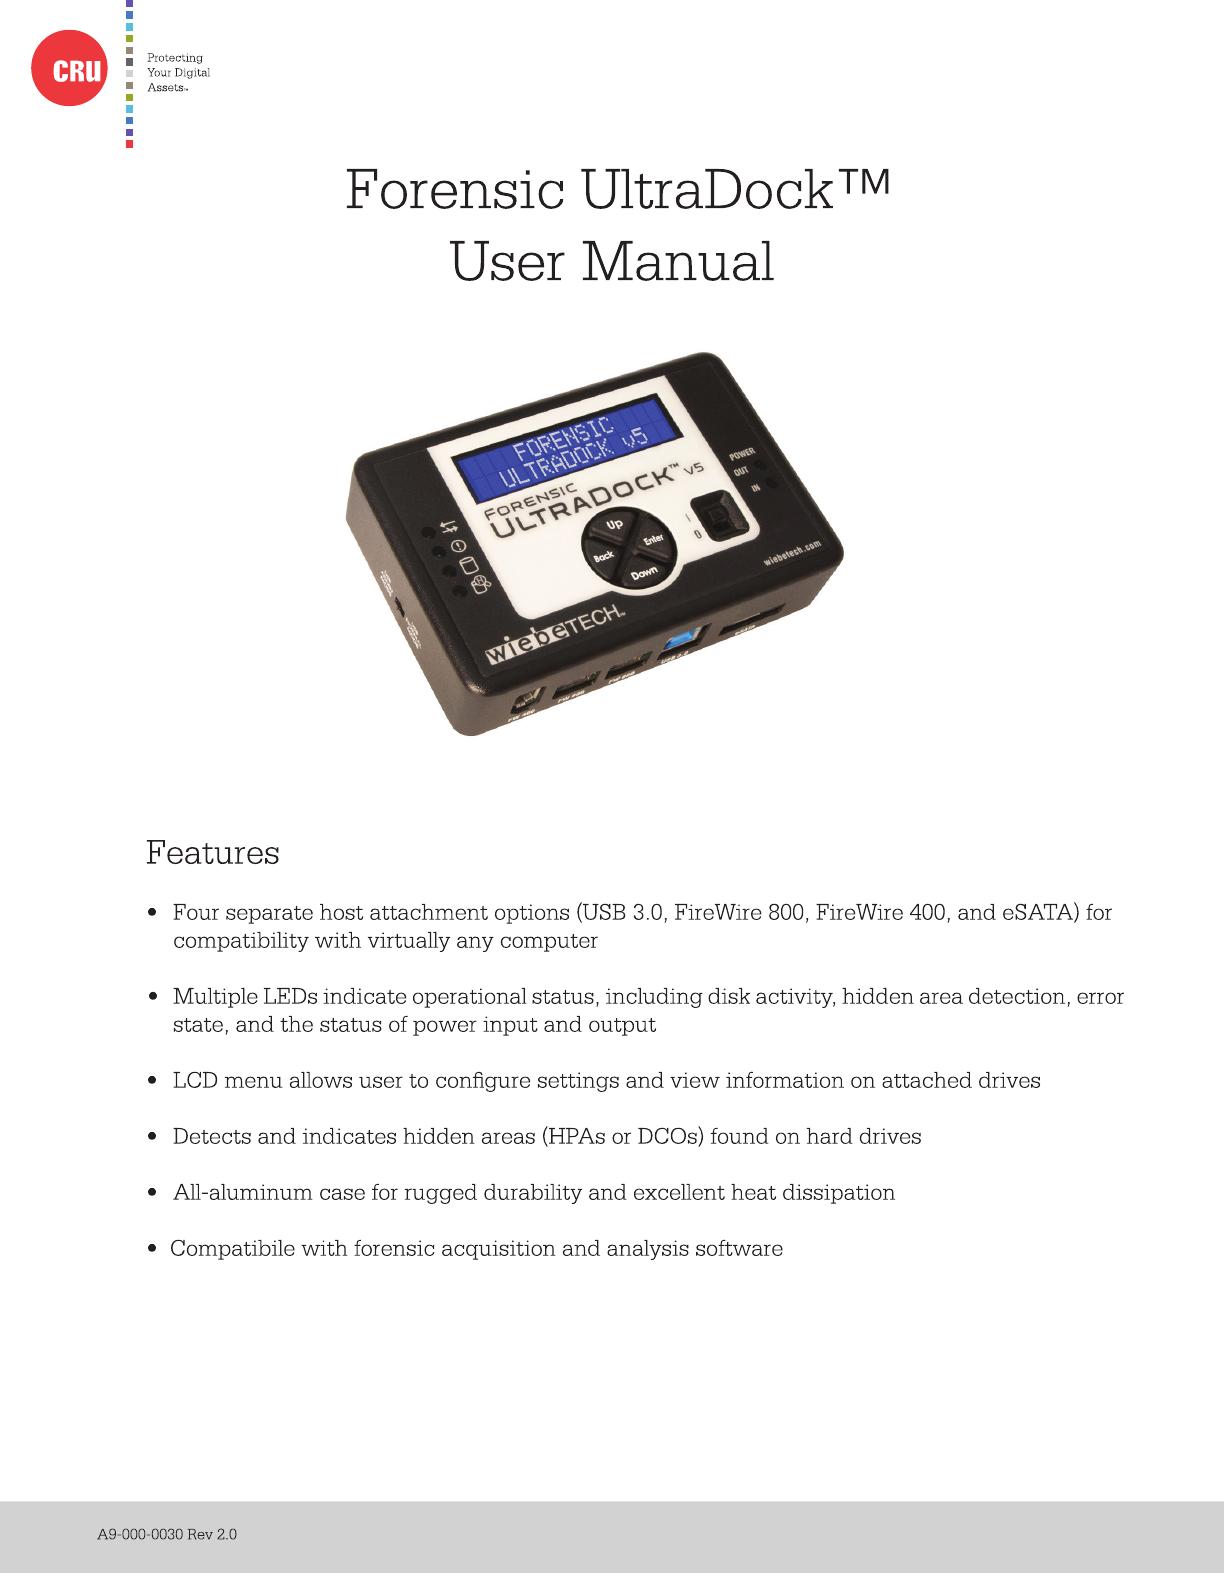 Forensic Ultra Dock V5 User Manual